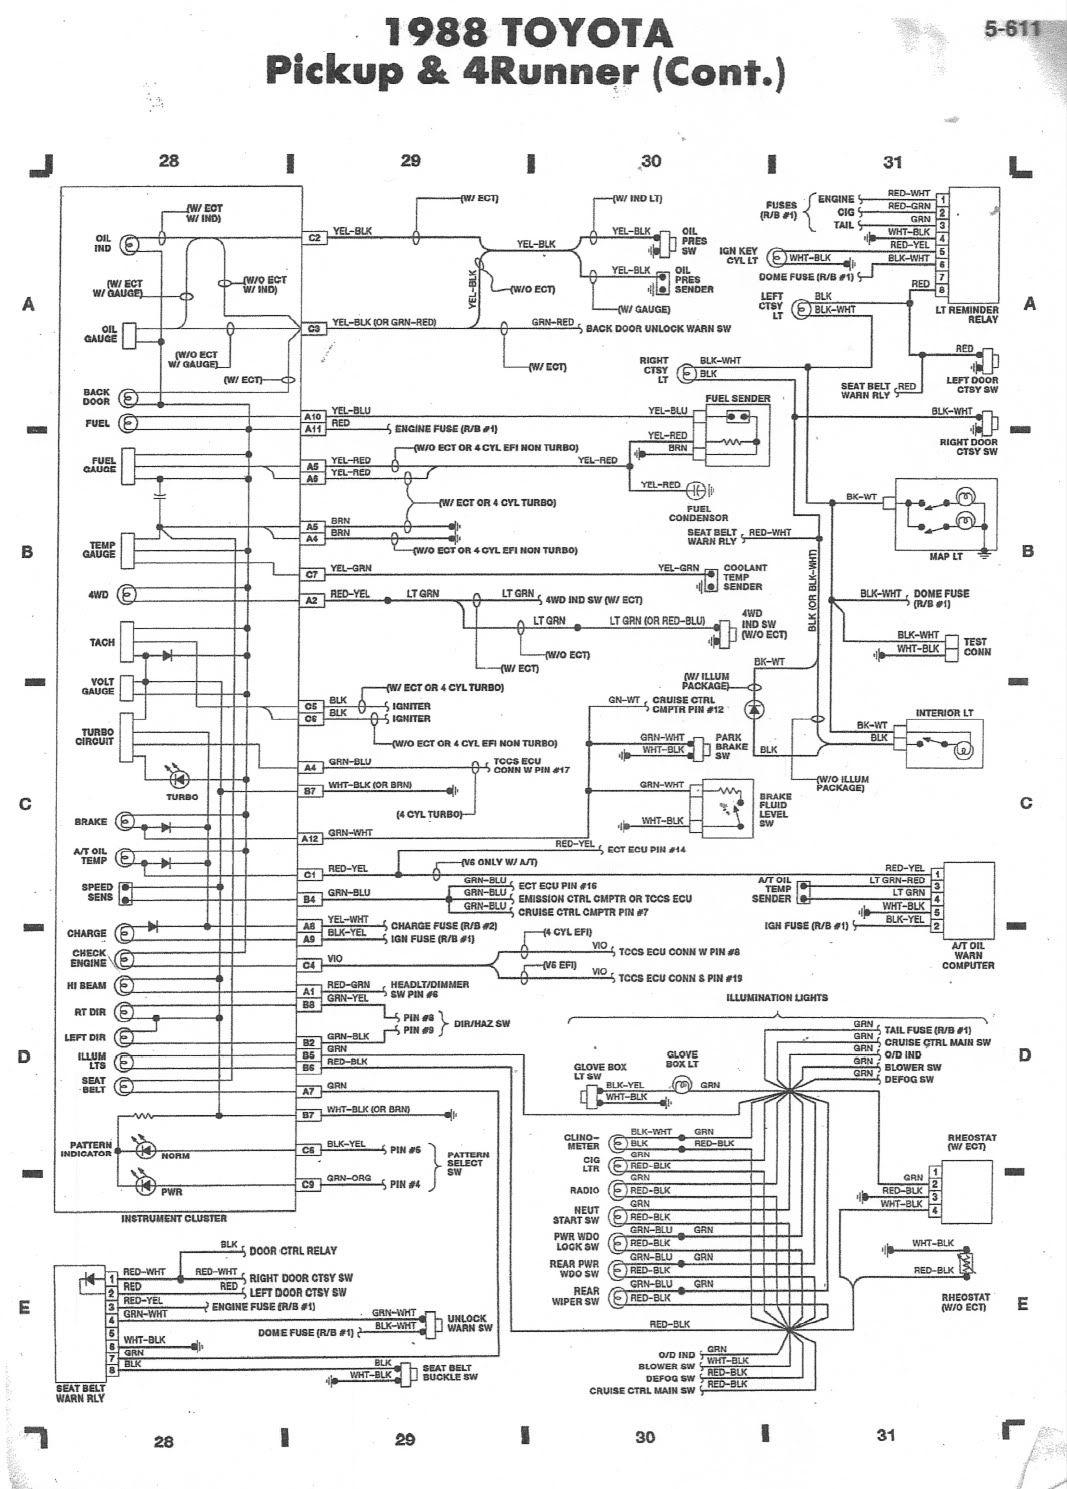 '88 3VZE 5-speed wiring diagram help. - Page 2 - YotaTech Forums